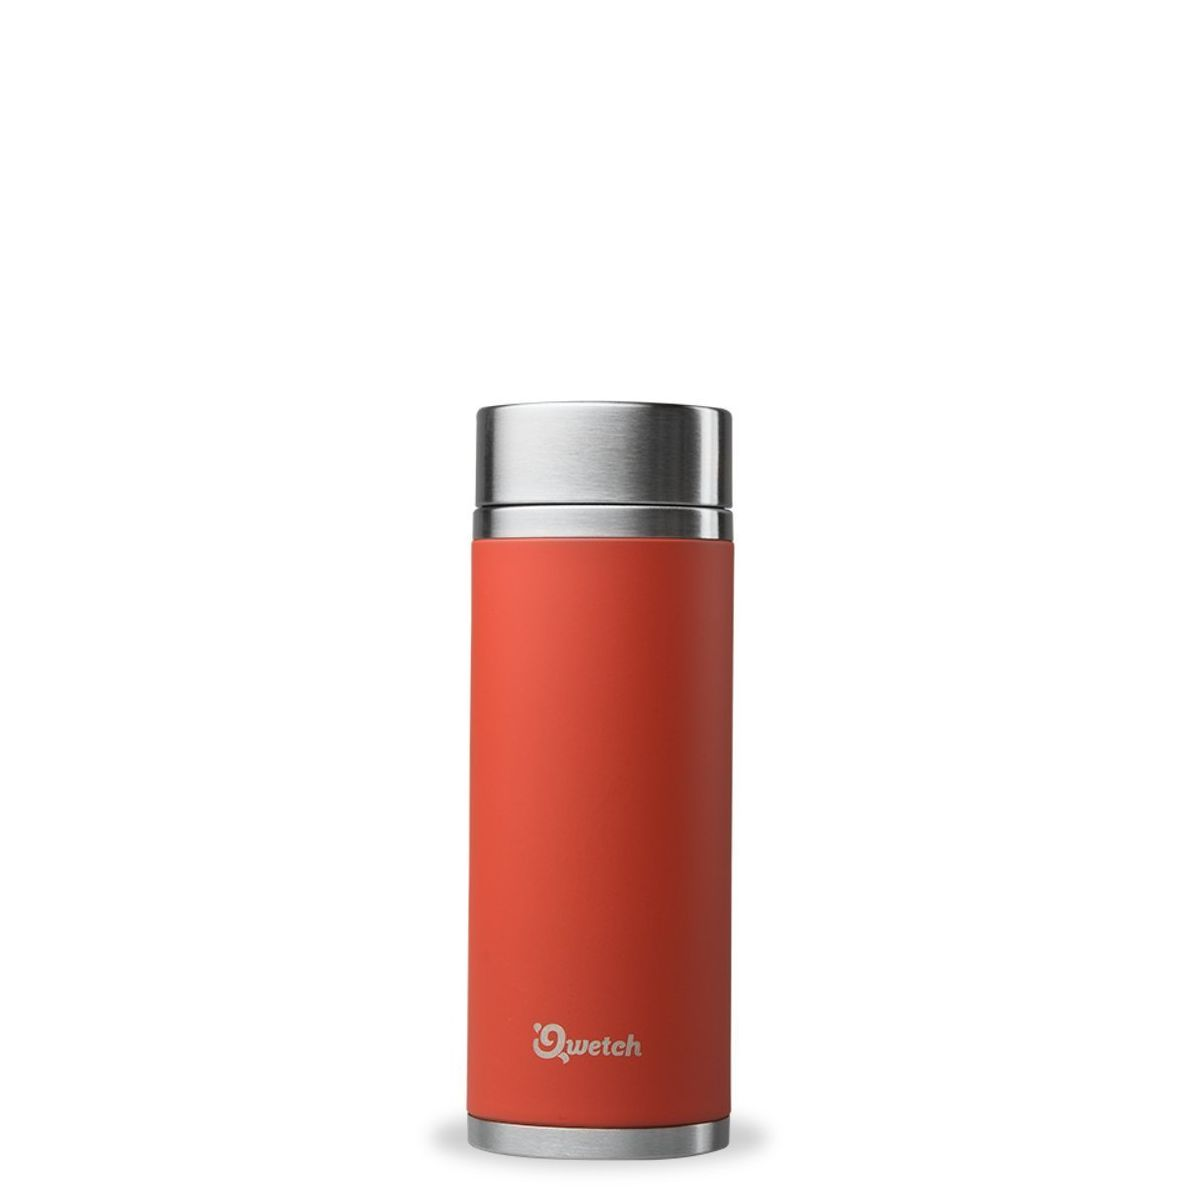 Théière nomade isotherme en inox 300 ml Rouge